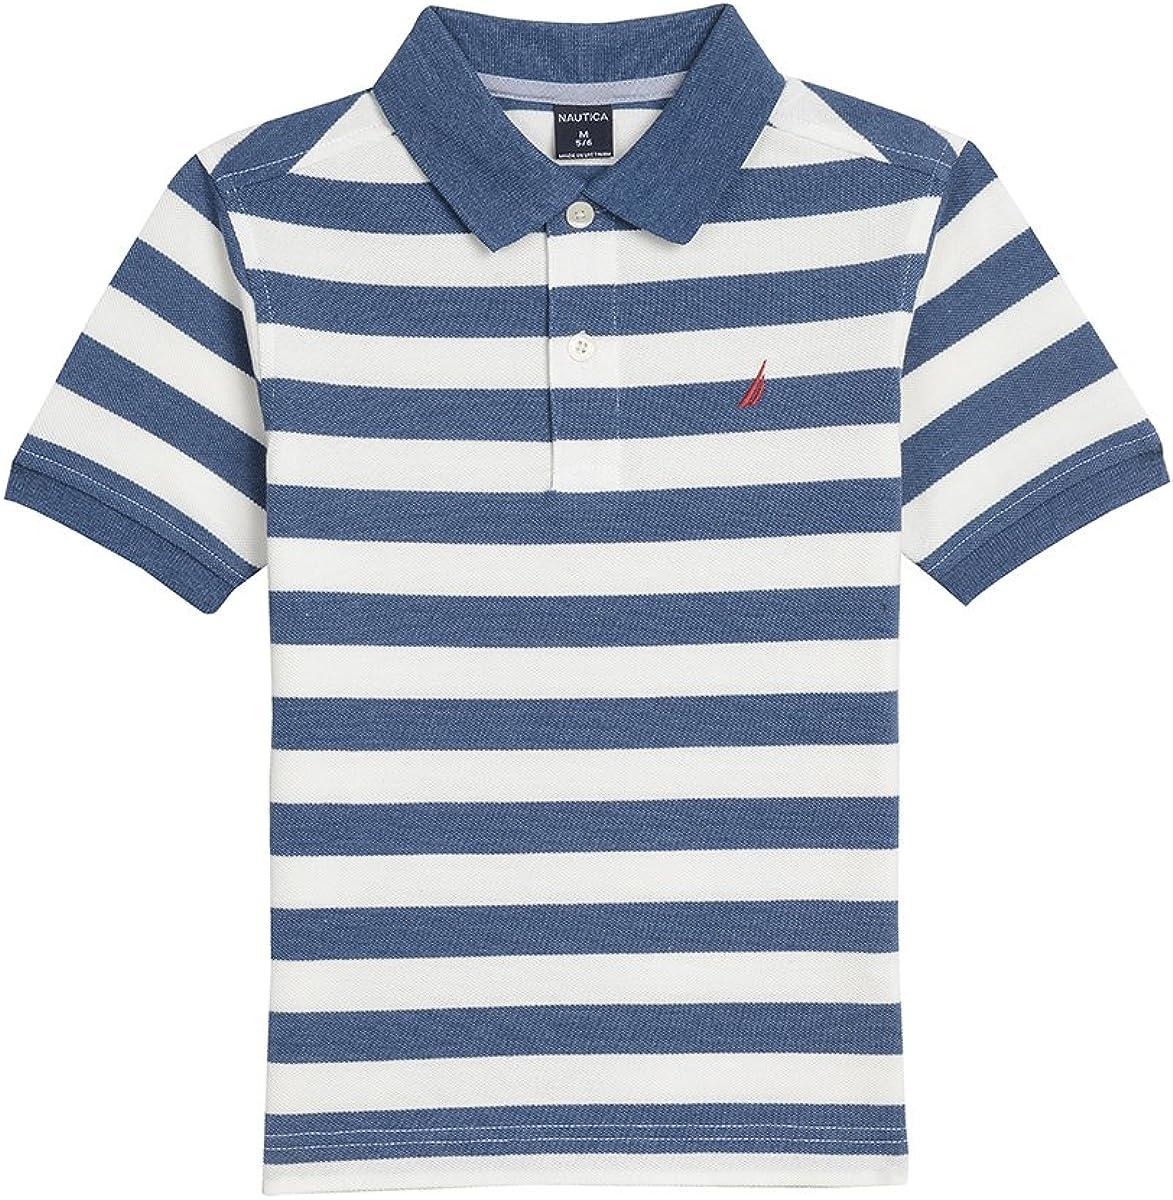 Nautica Boys Short Sleeve Striped Deck Polo Shirt